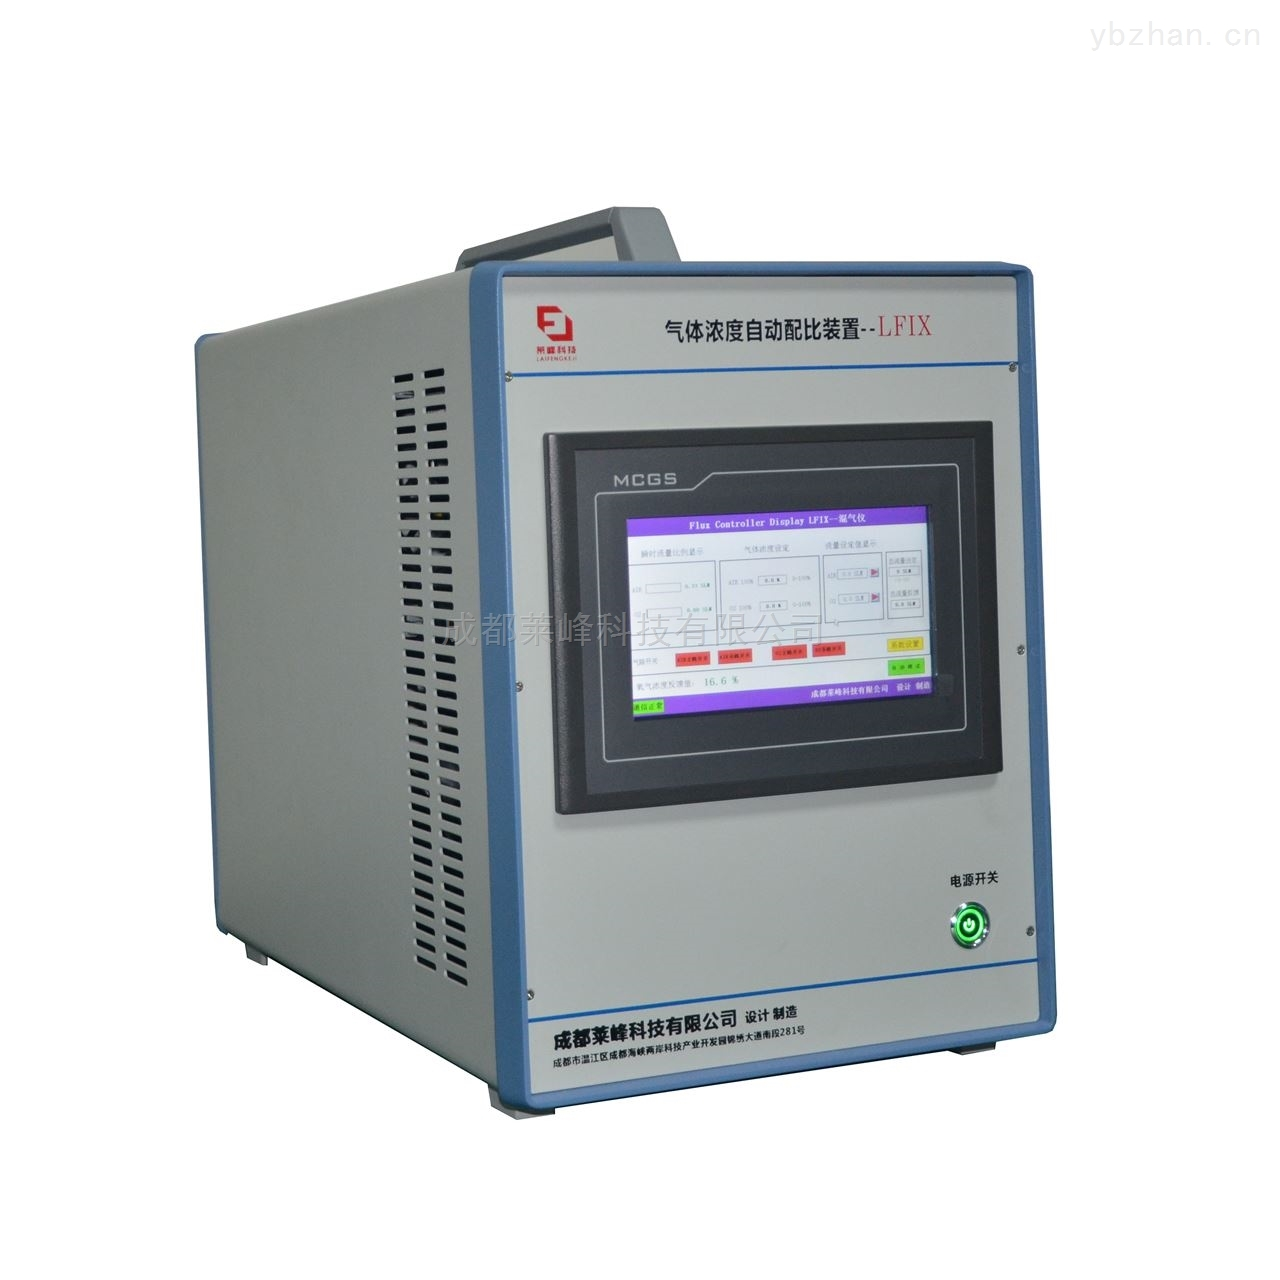 LFIX--高精度混气仪生产厂家/动态配气仪电脑版